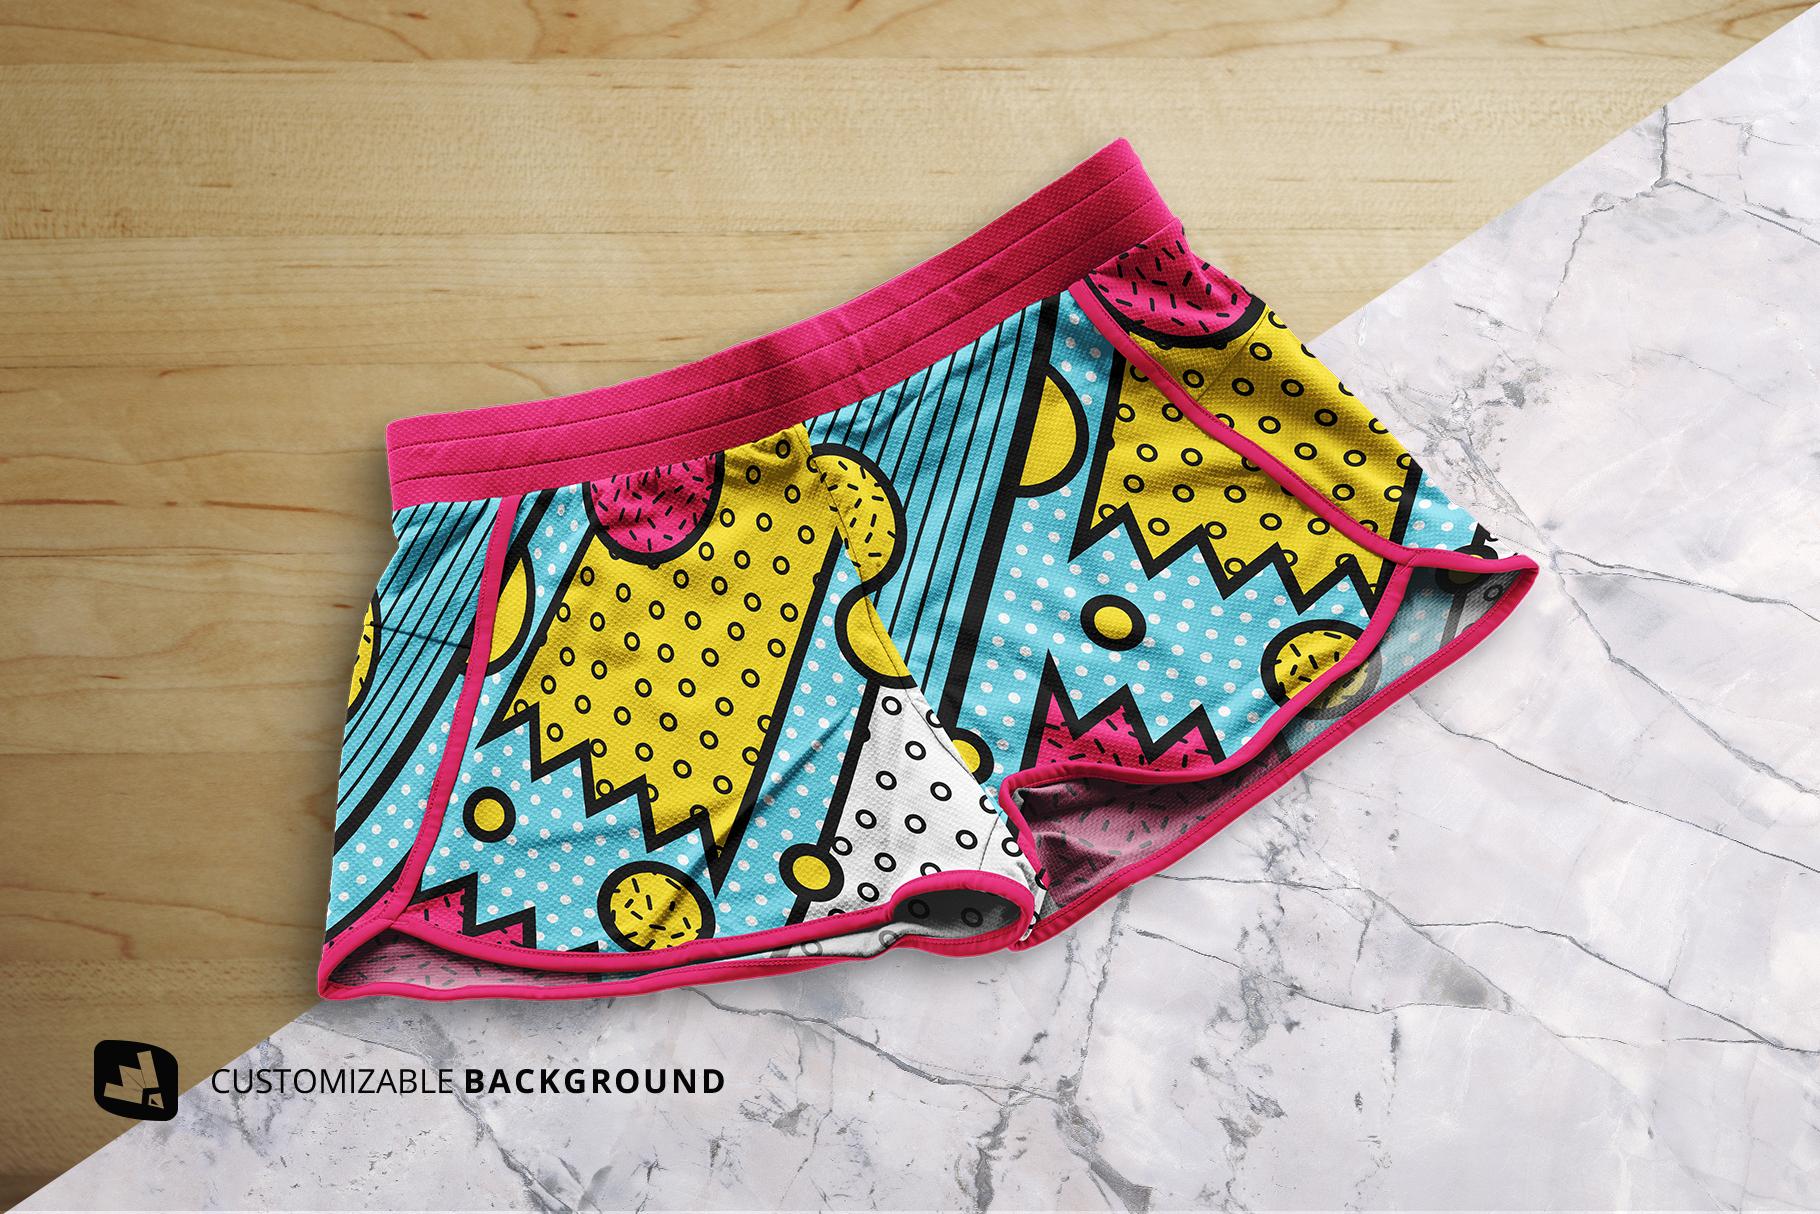 background options of the female sportswear shorts mockup